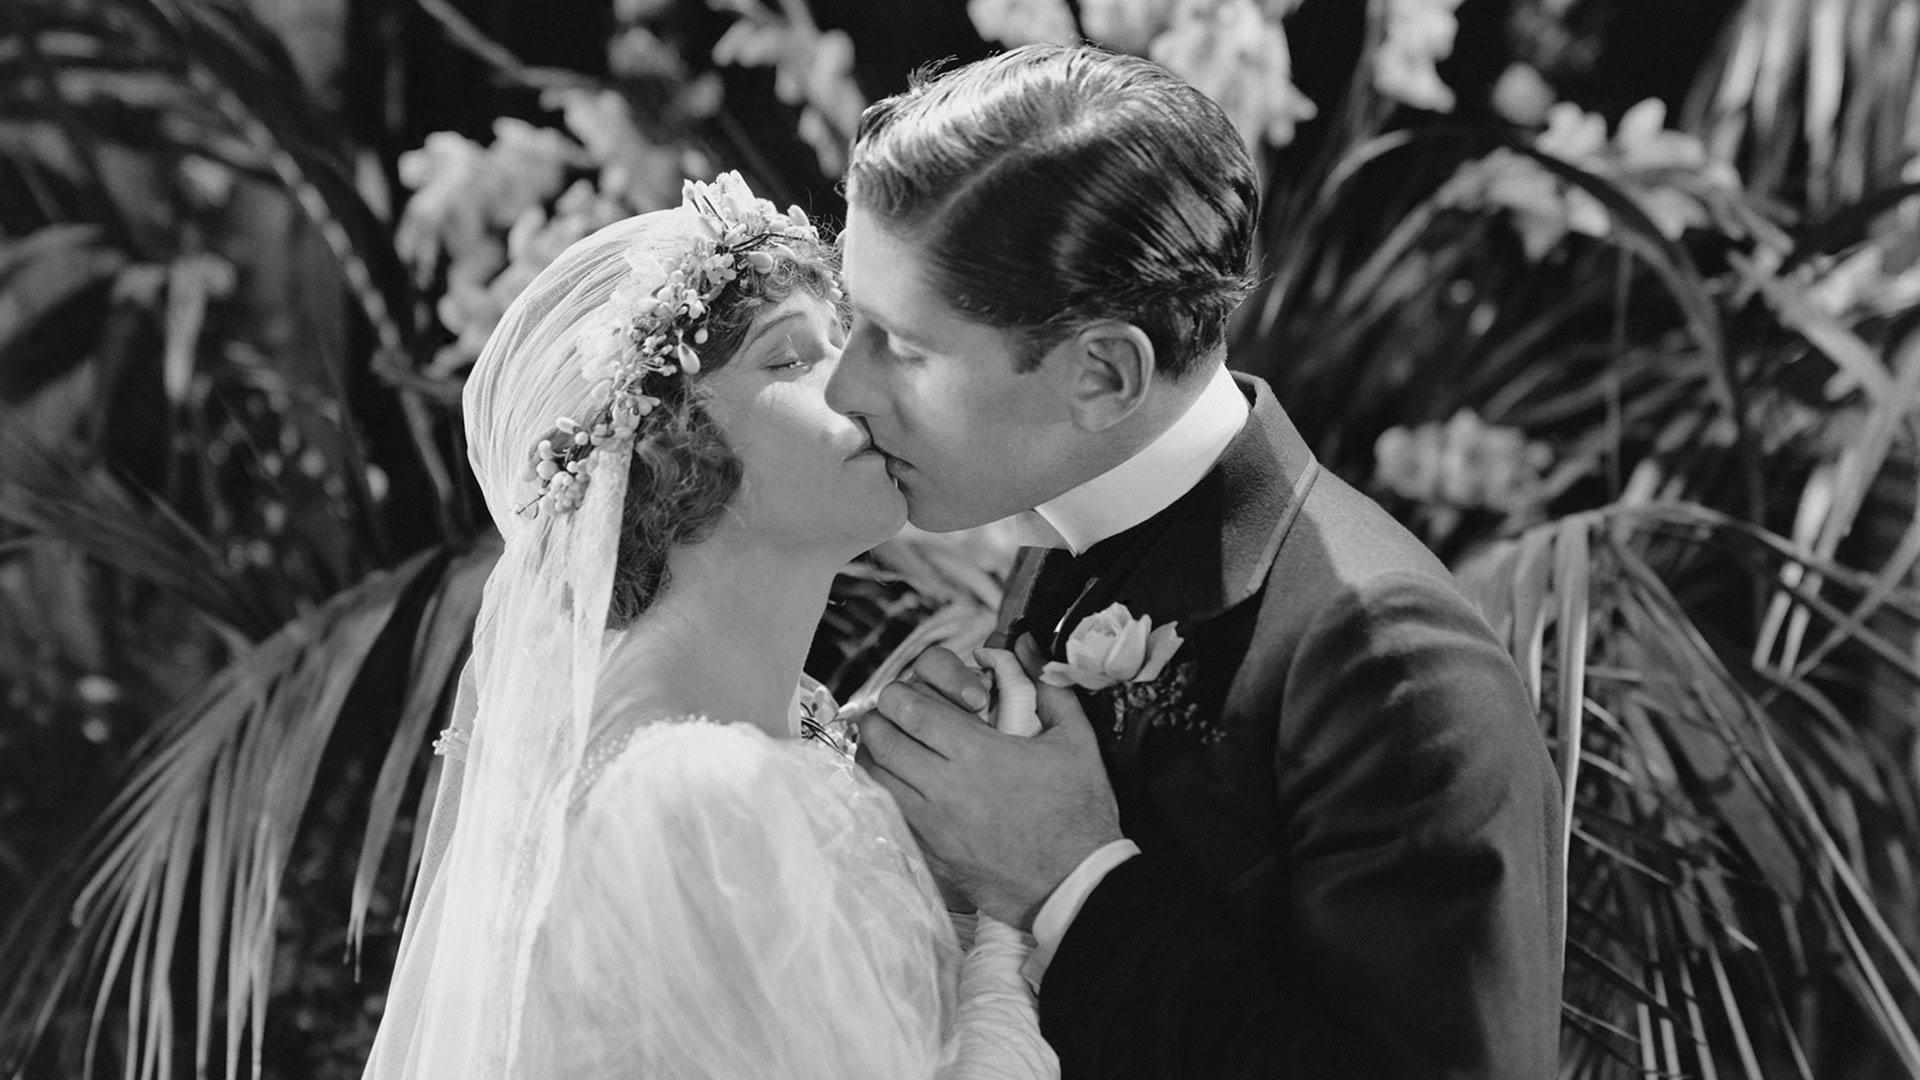 KISSING THE BRIDE (EV001064_H)